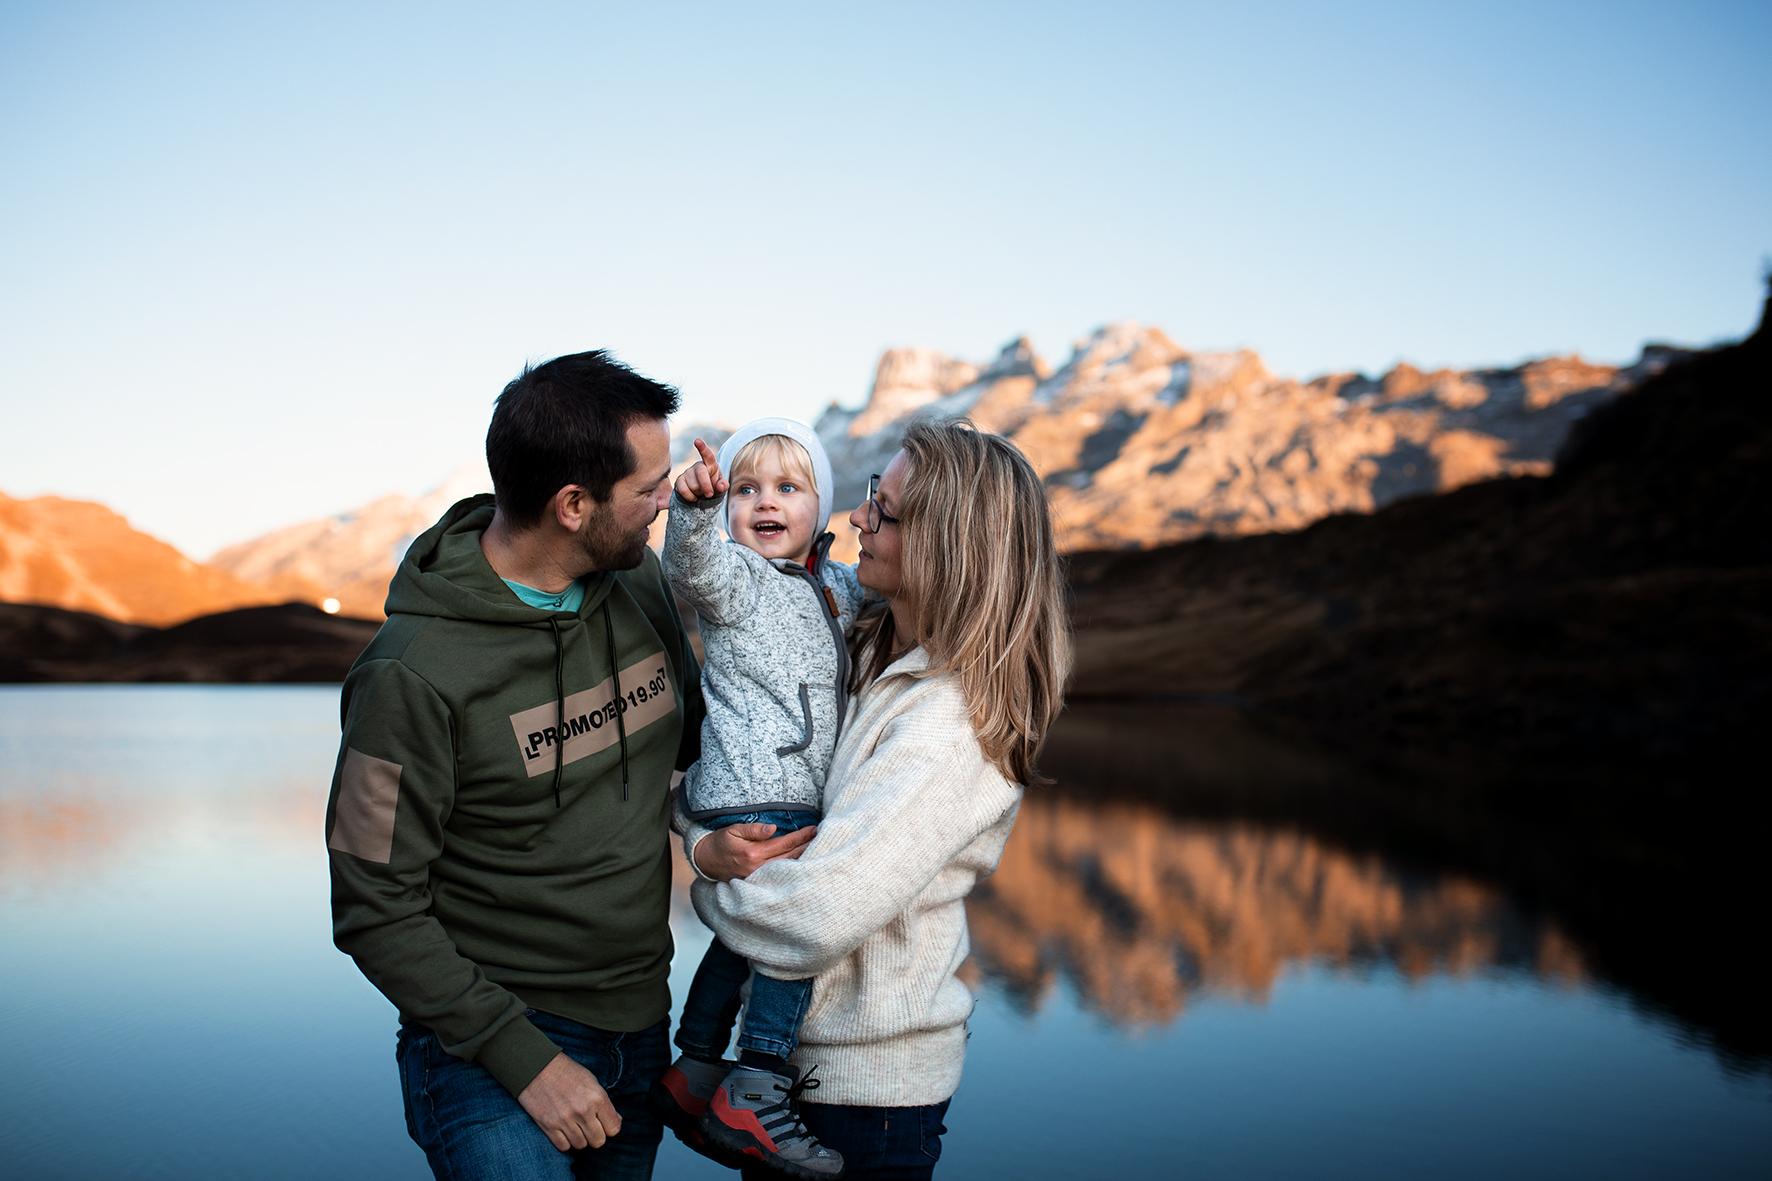 Familienshooting_Familienfotografie_Luzern_Schweiz_20